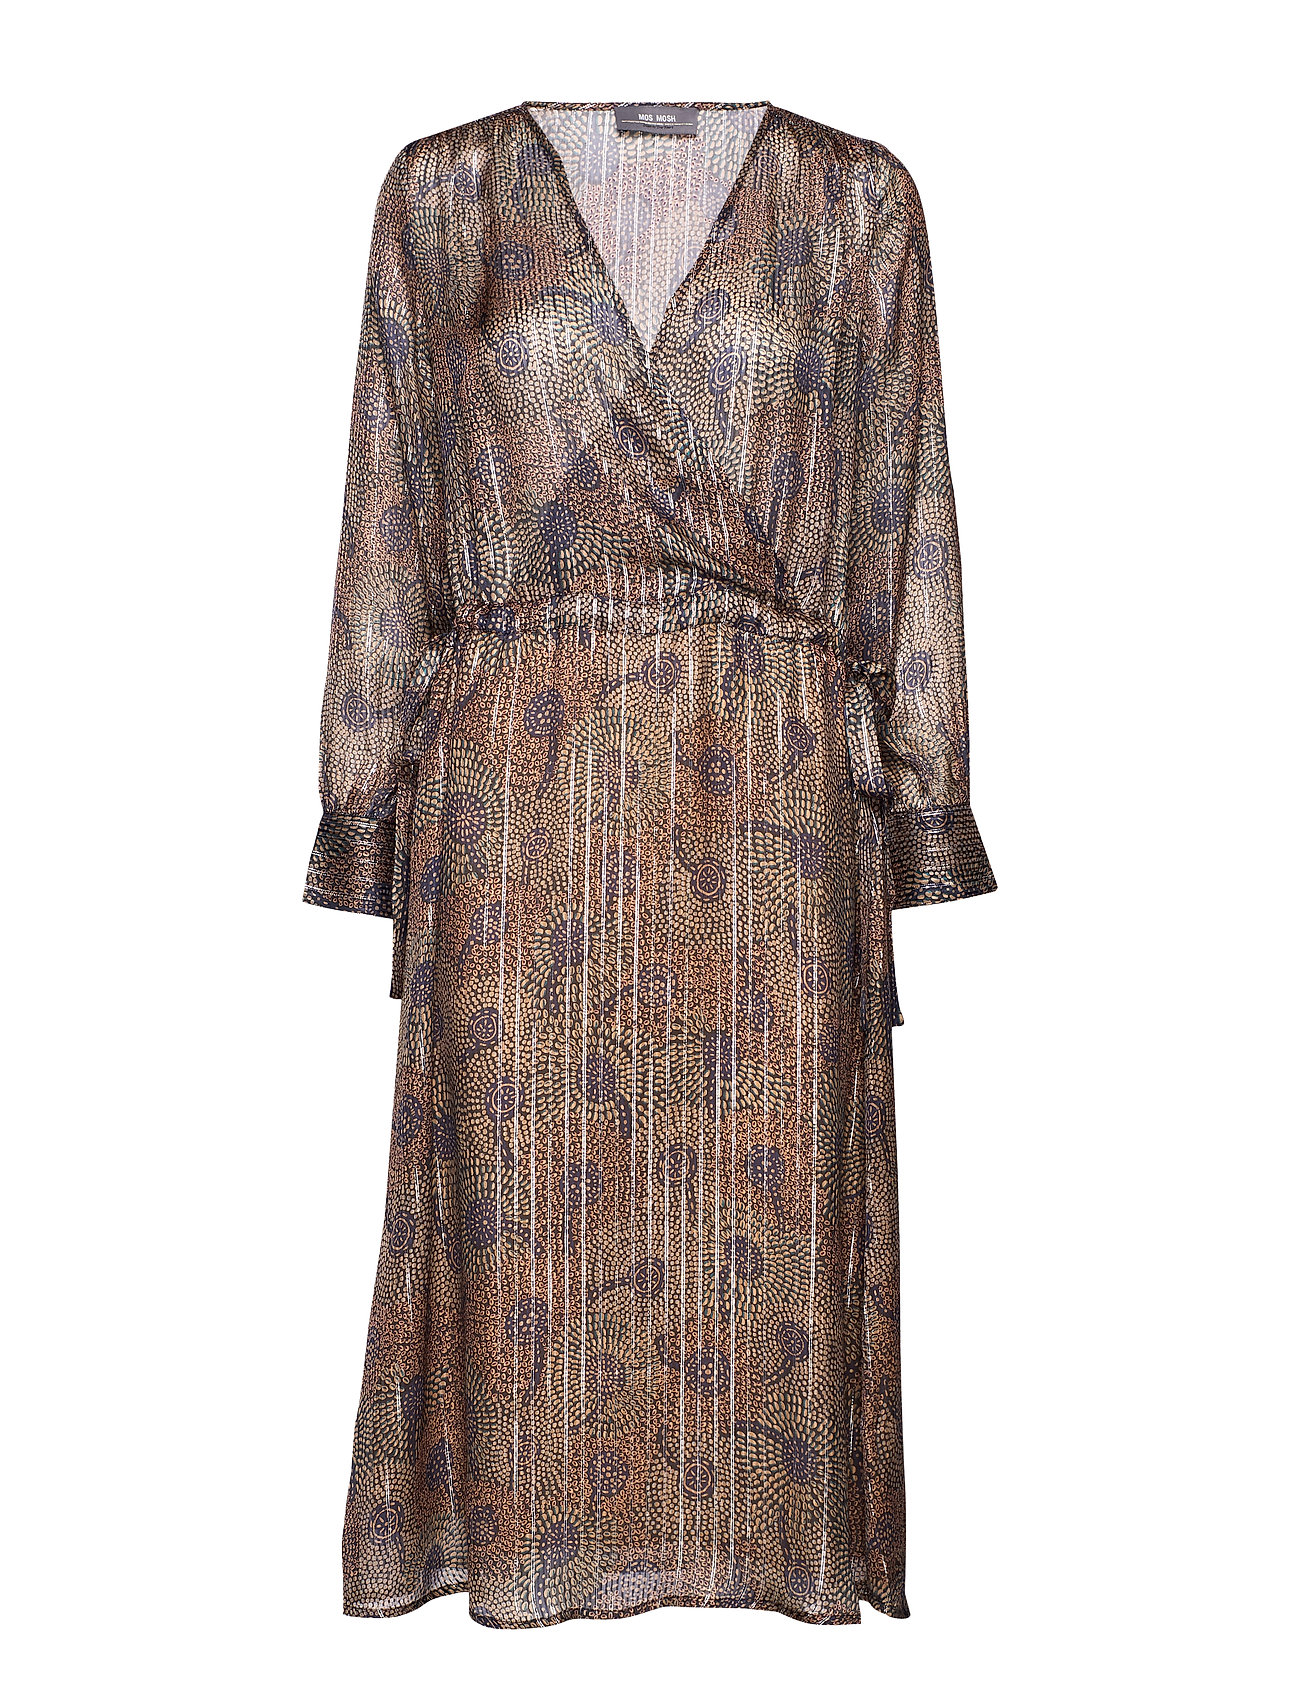 MOS MOSH Chita Peacock Dress - PEACOCK PRINT